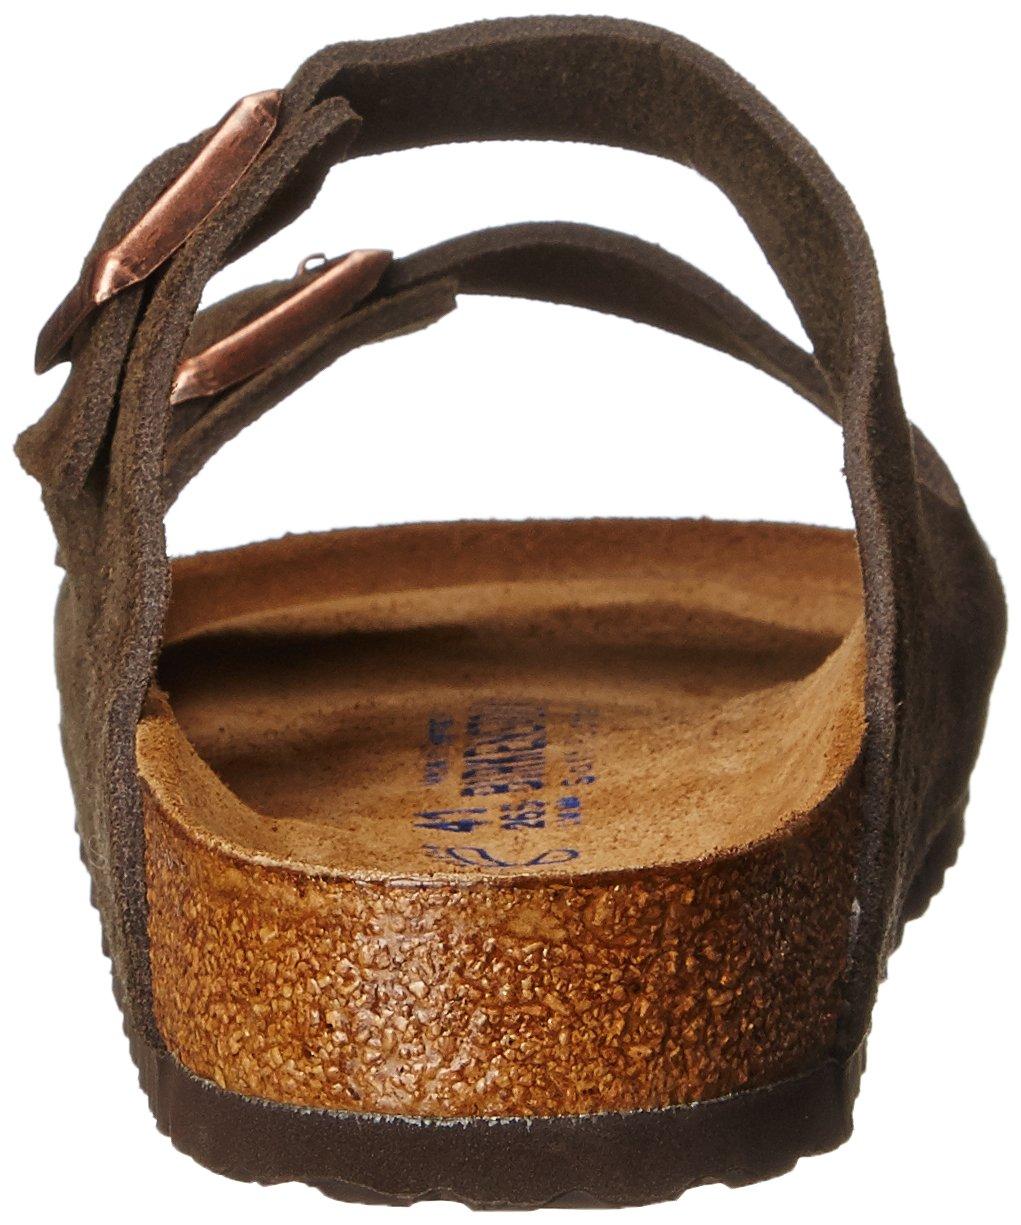 Birkenstock Unisex Arizona Mocha Suede Sandals - 35 N EU / 4-4.5 2A(N) US by Birkenstock (Image #2)